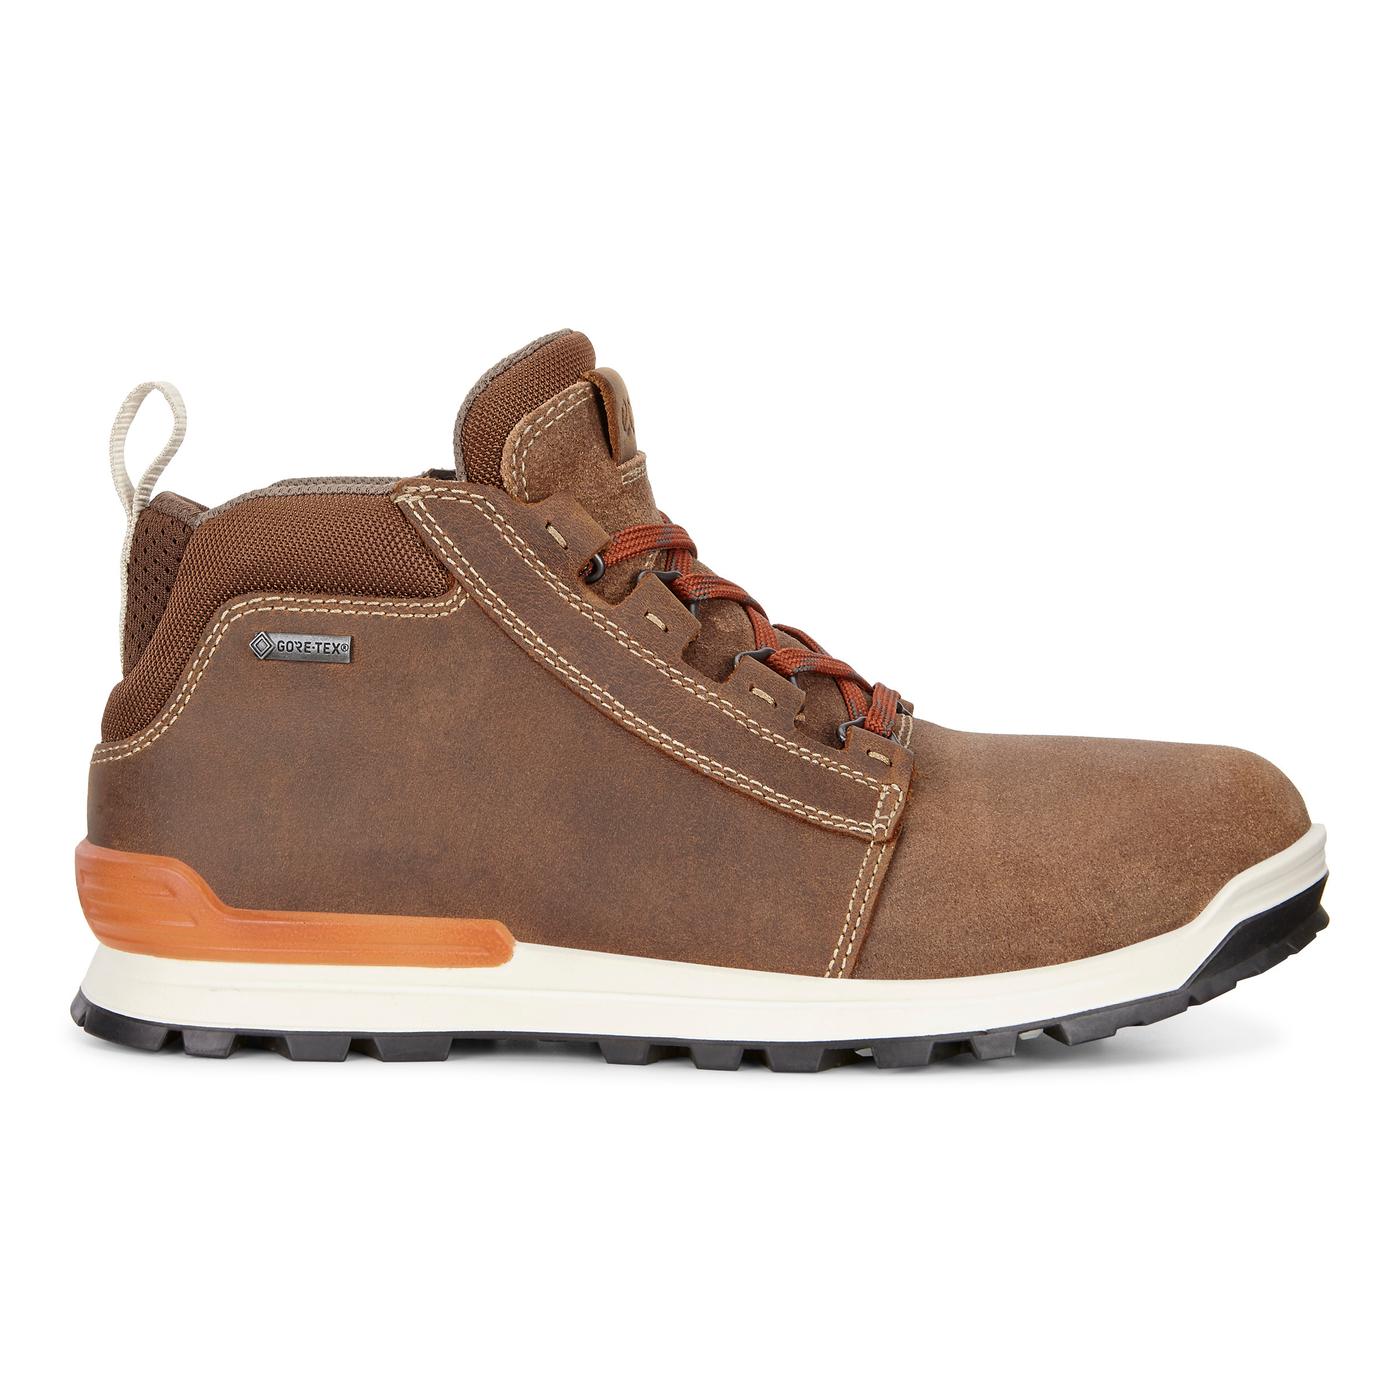 635ce54e ECCO Men's Oregon GTX Hiking Boots | ECCO® Shoes